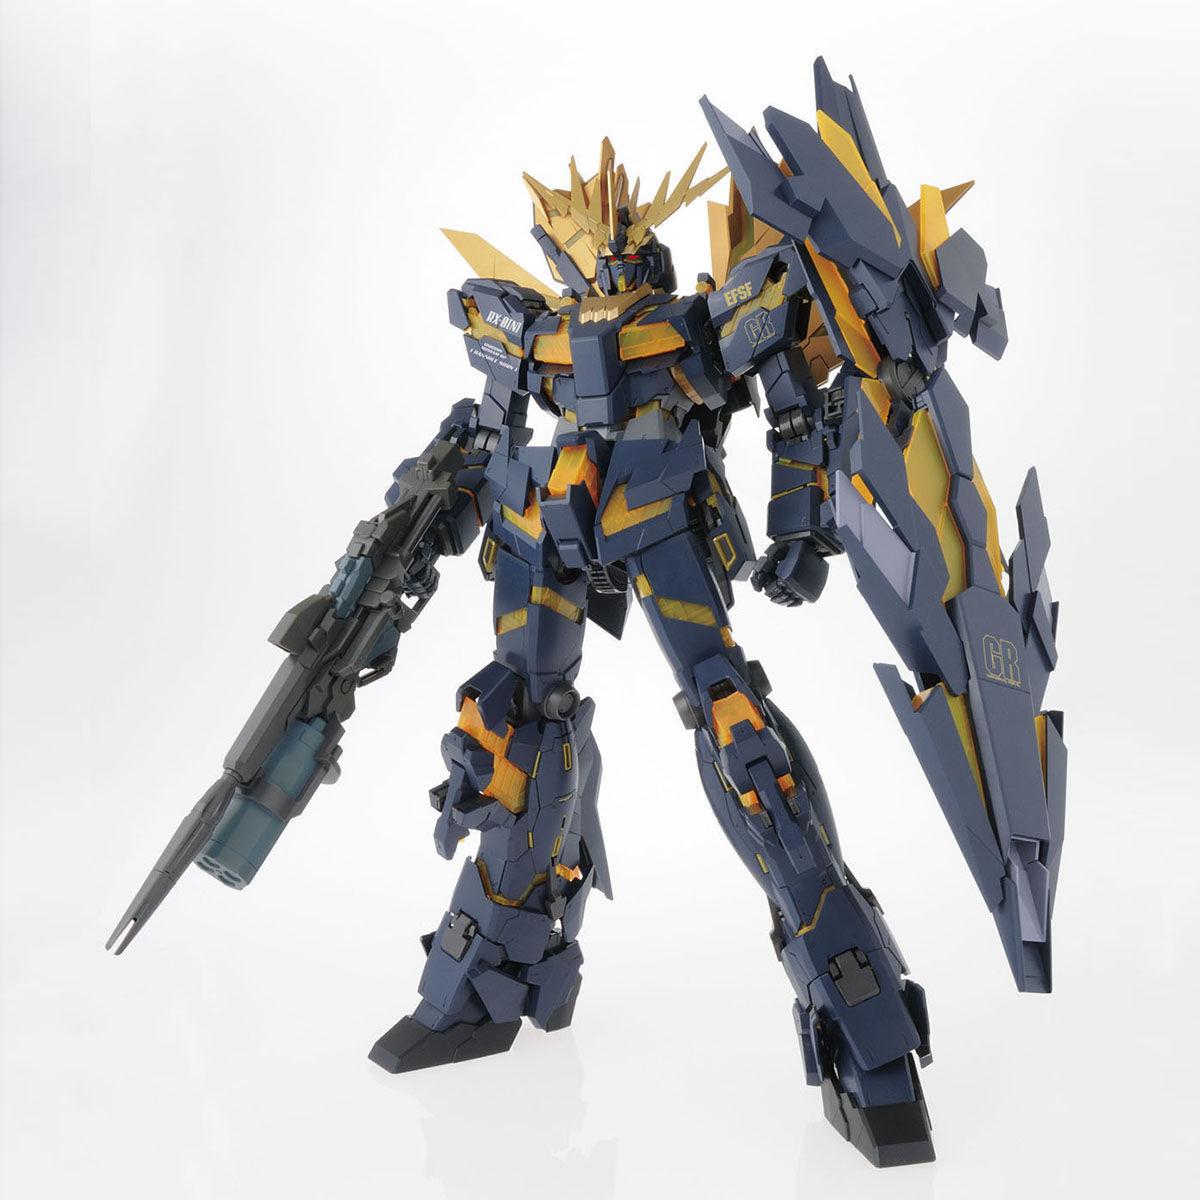 PG 1/60 RX-0[N] UNICORN GUNDAM 02 BANSHEE NORN [Sep 2020 Delivery]